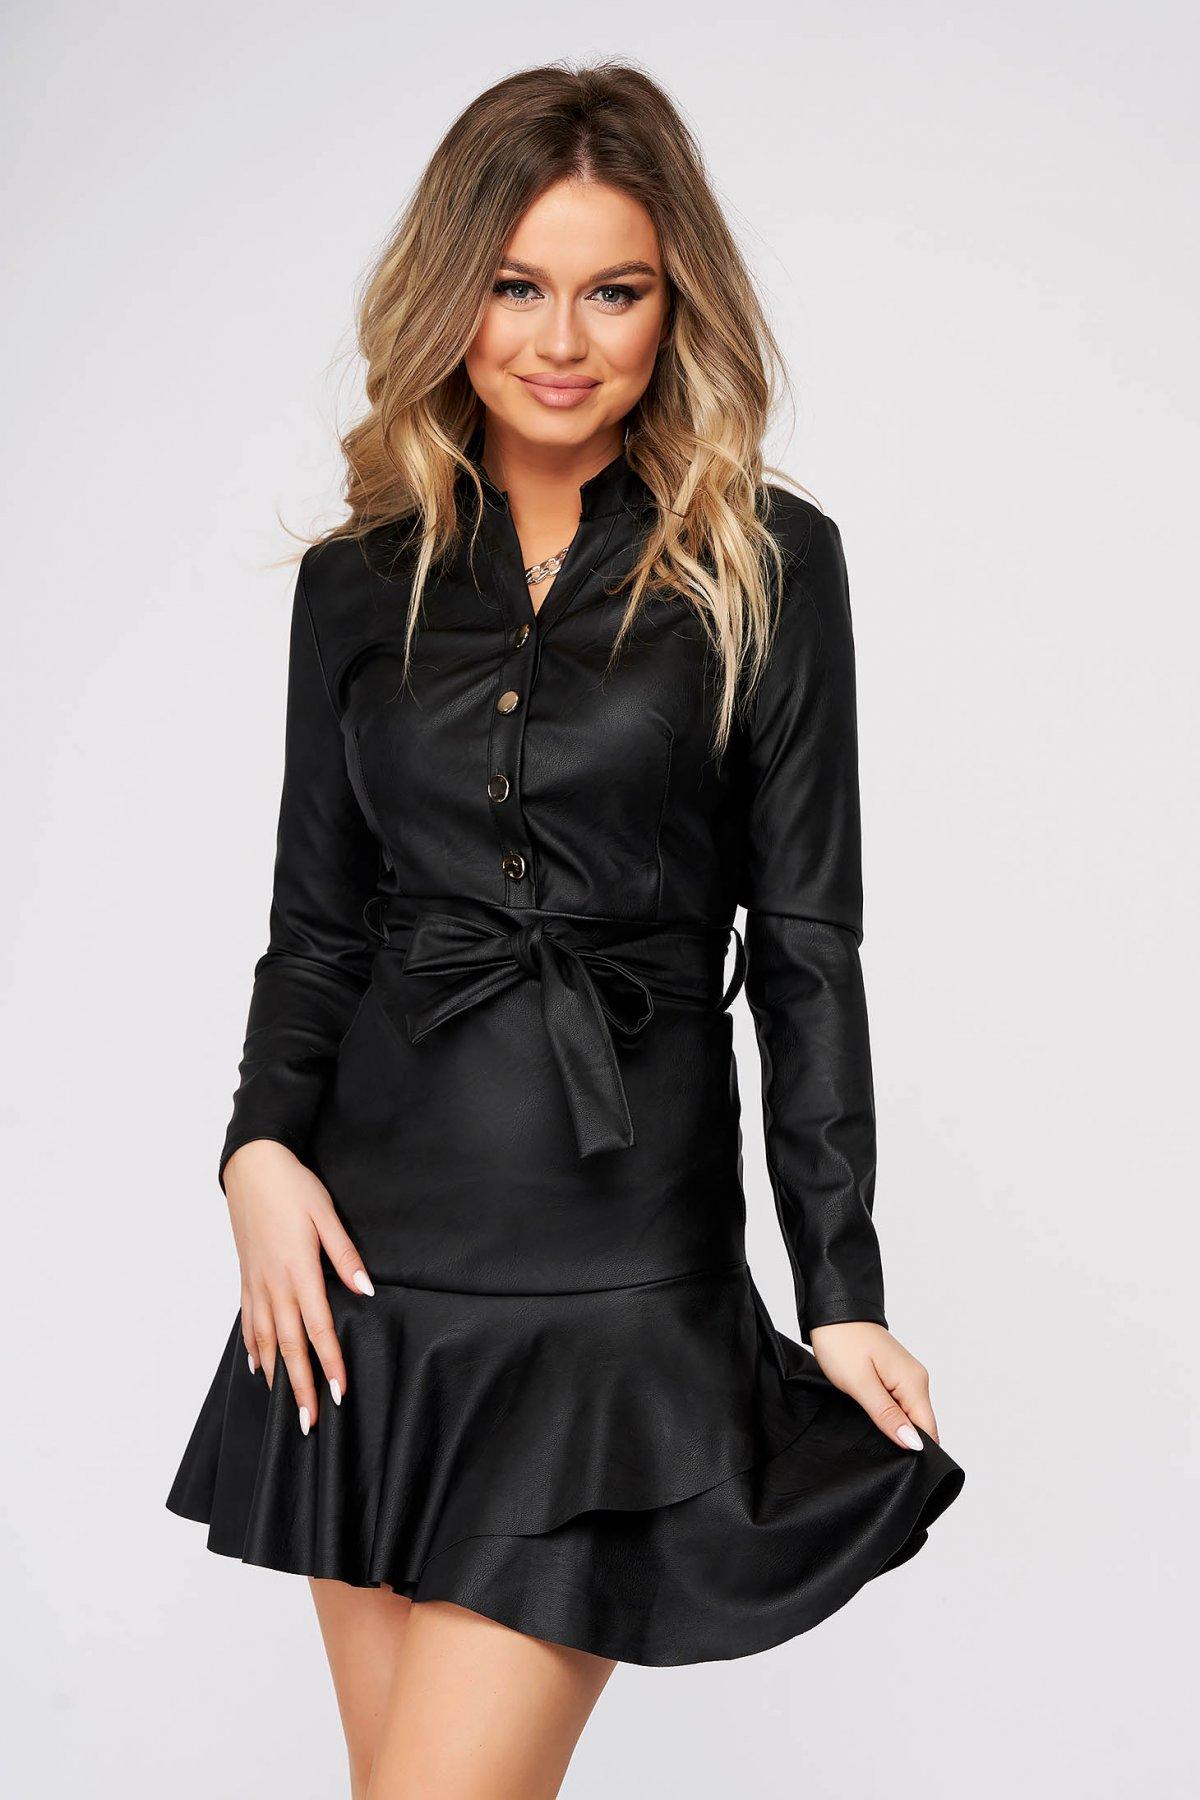 Rochie SunShine neagra de zi imitatie de piele in clos cu volanase la baza rochiei accesorizata cu cordon